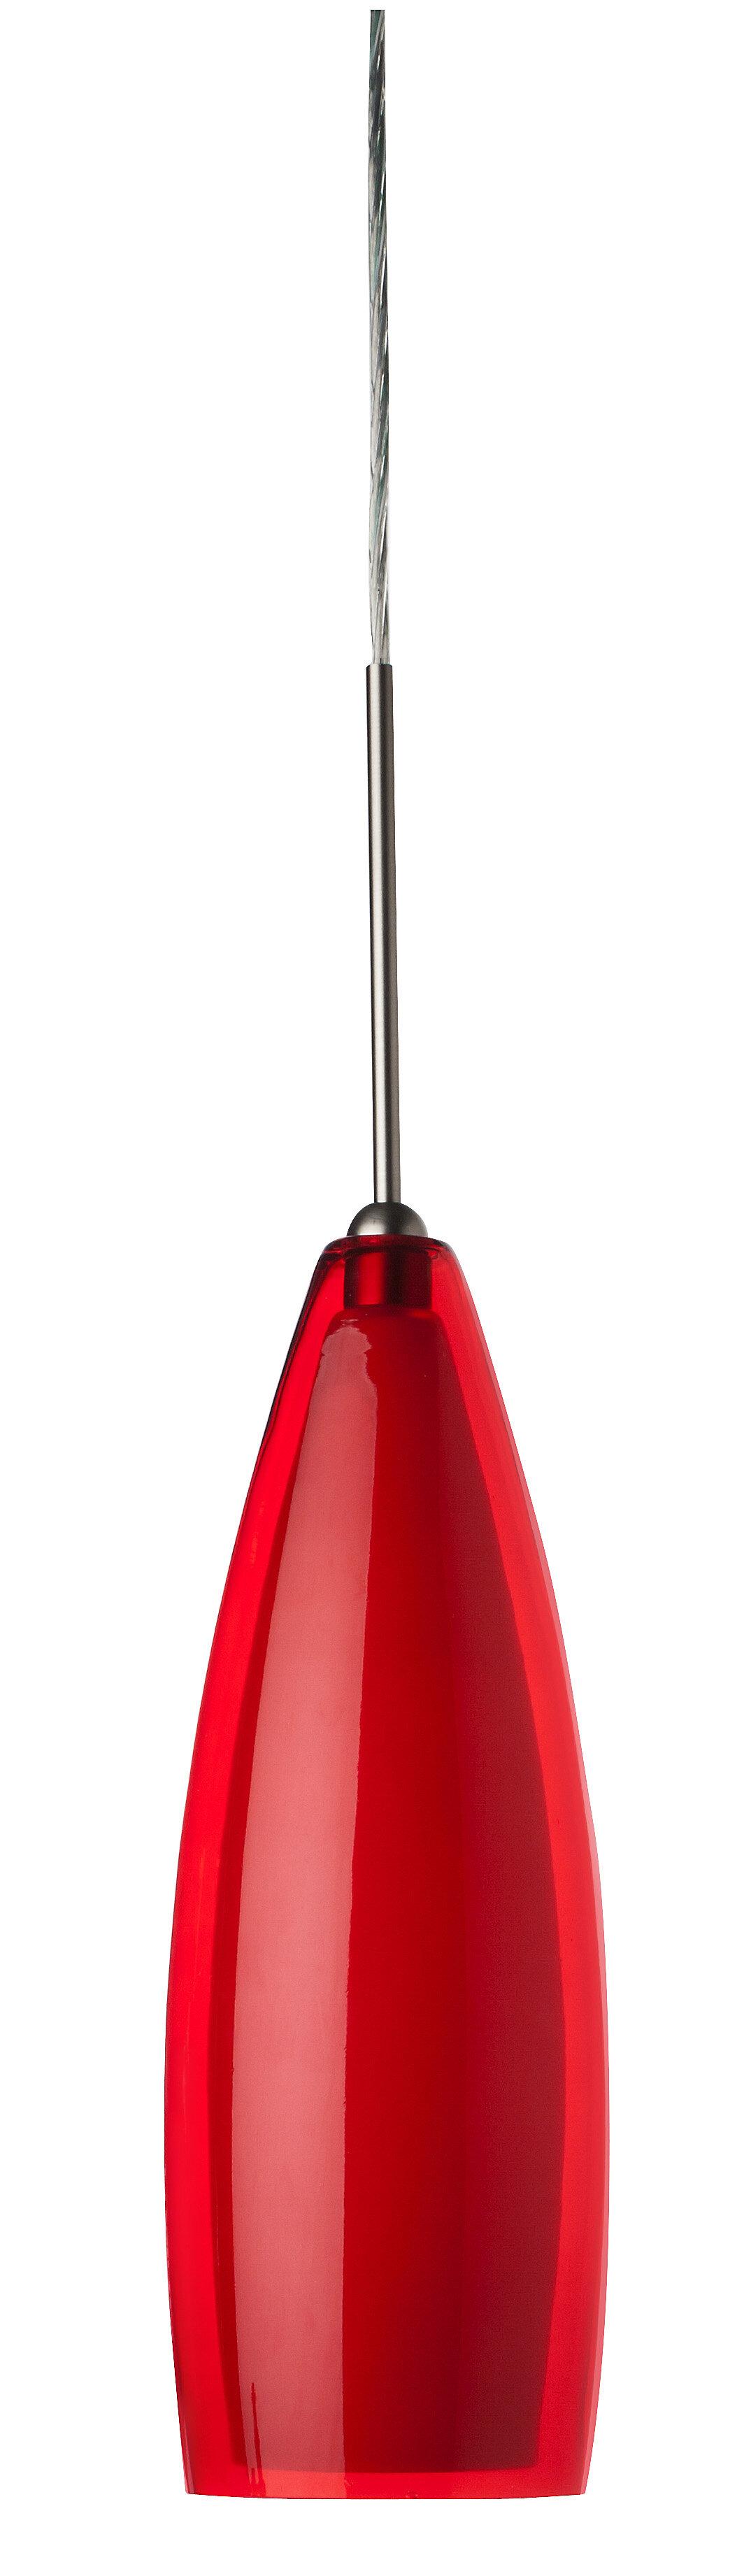 Red Shade Orren Ellis Pendant Lighting You Ll Love In 2021 Wayfair